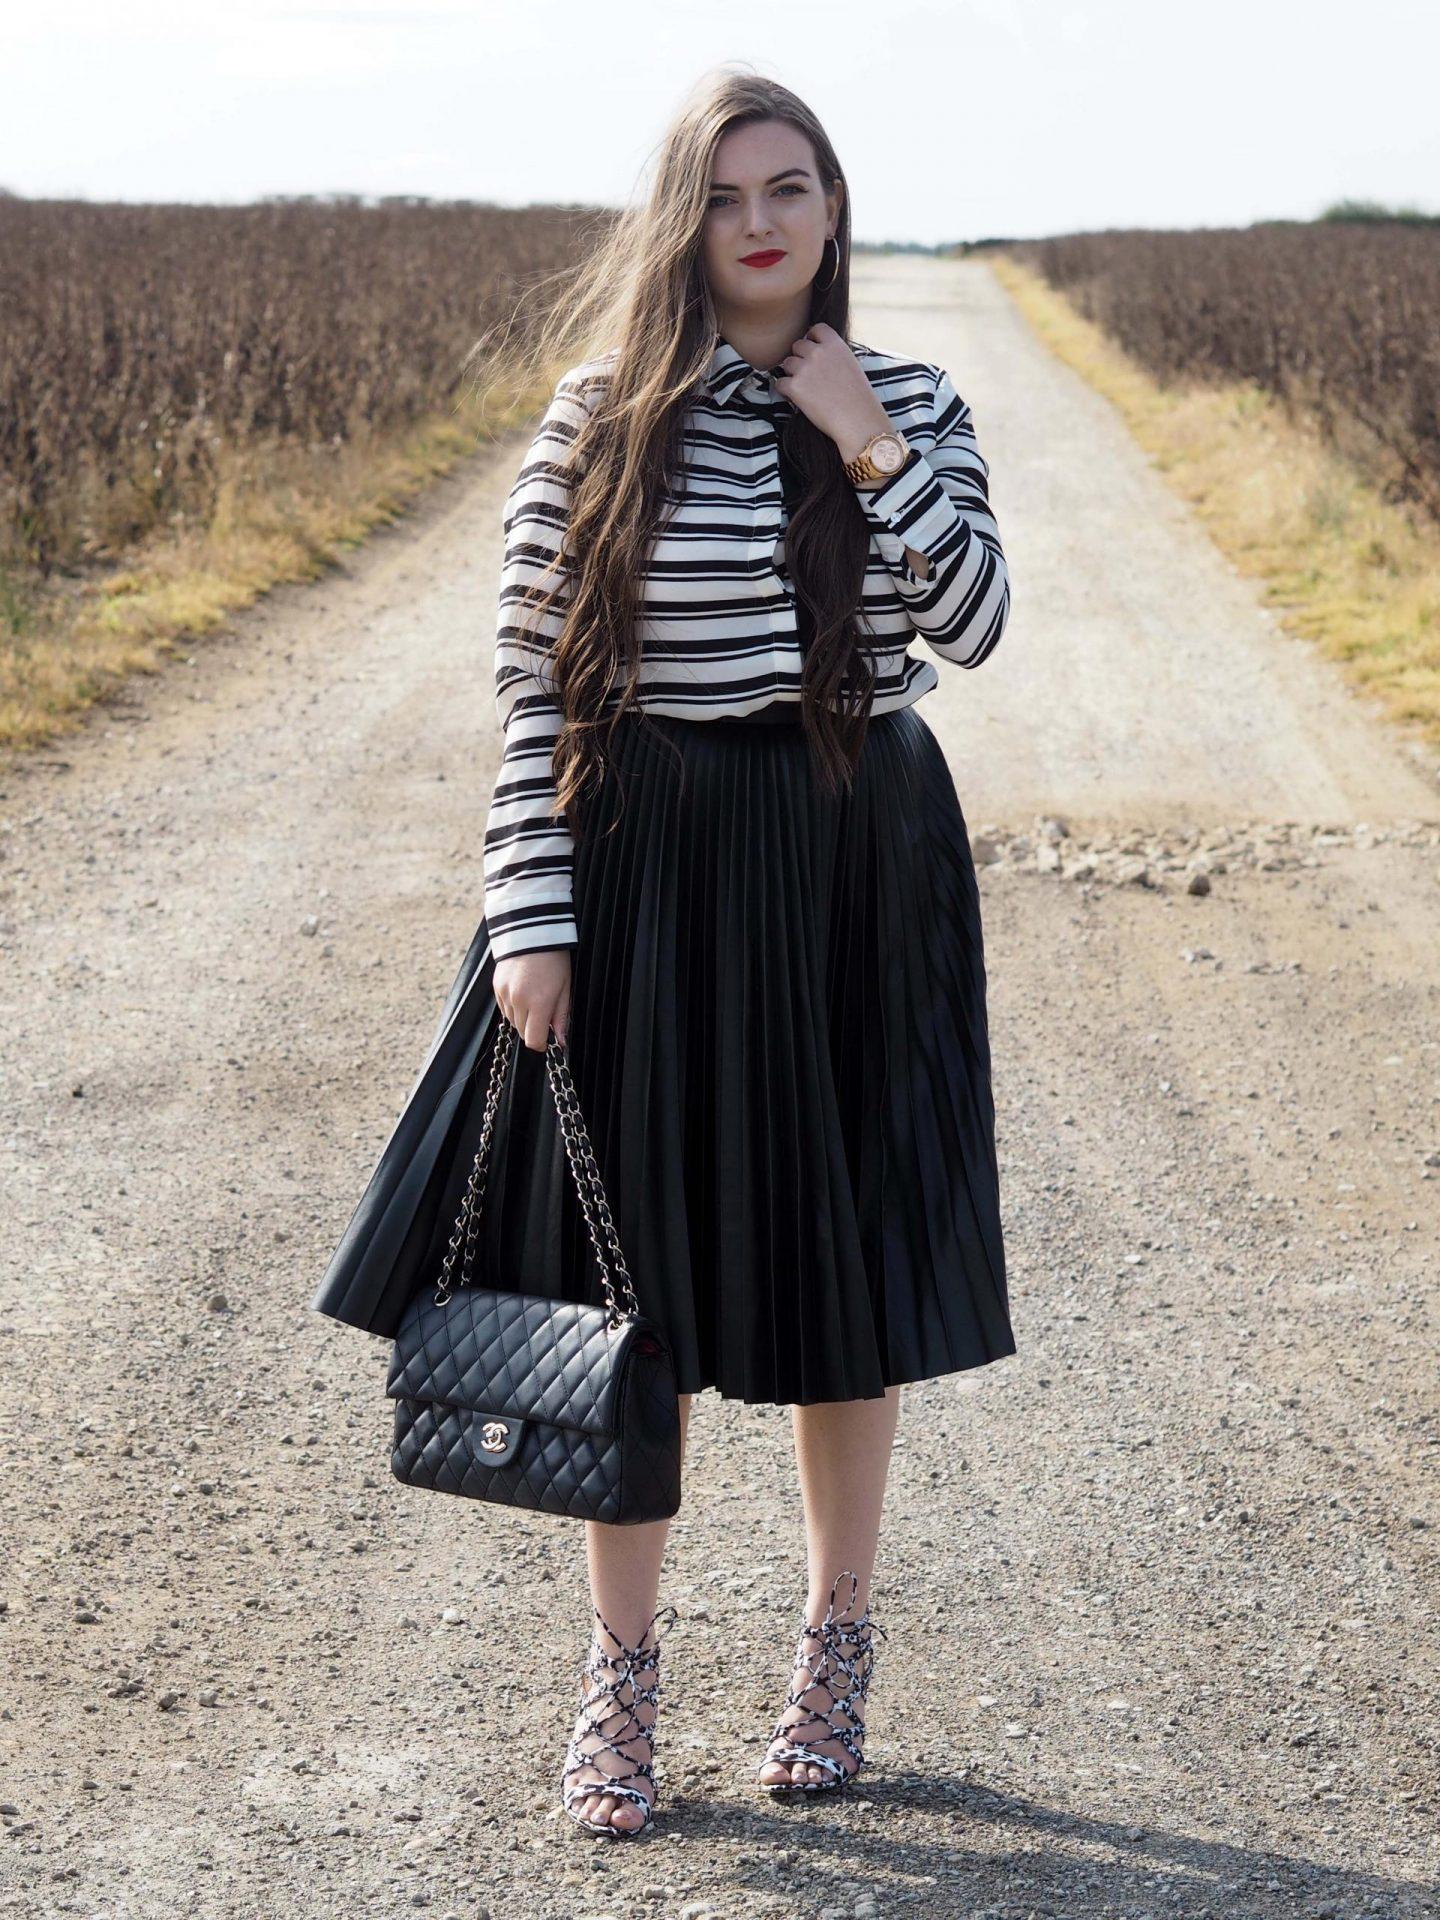 closet-leather-pleated-skirts-and-stripes-rachel-nicole-uk-blogger-3